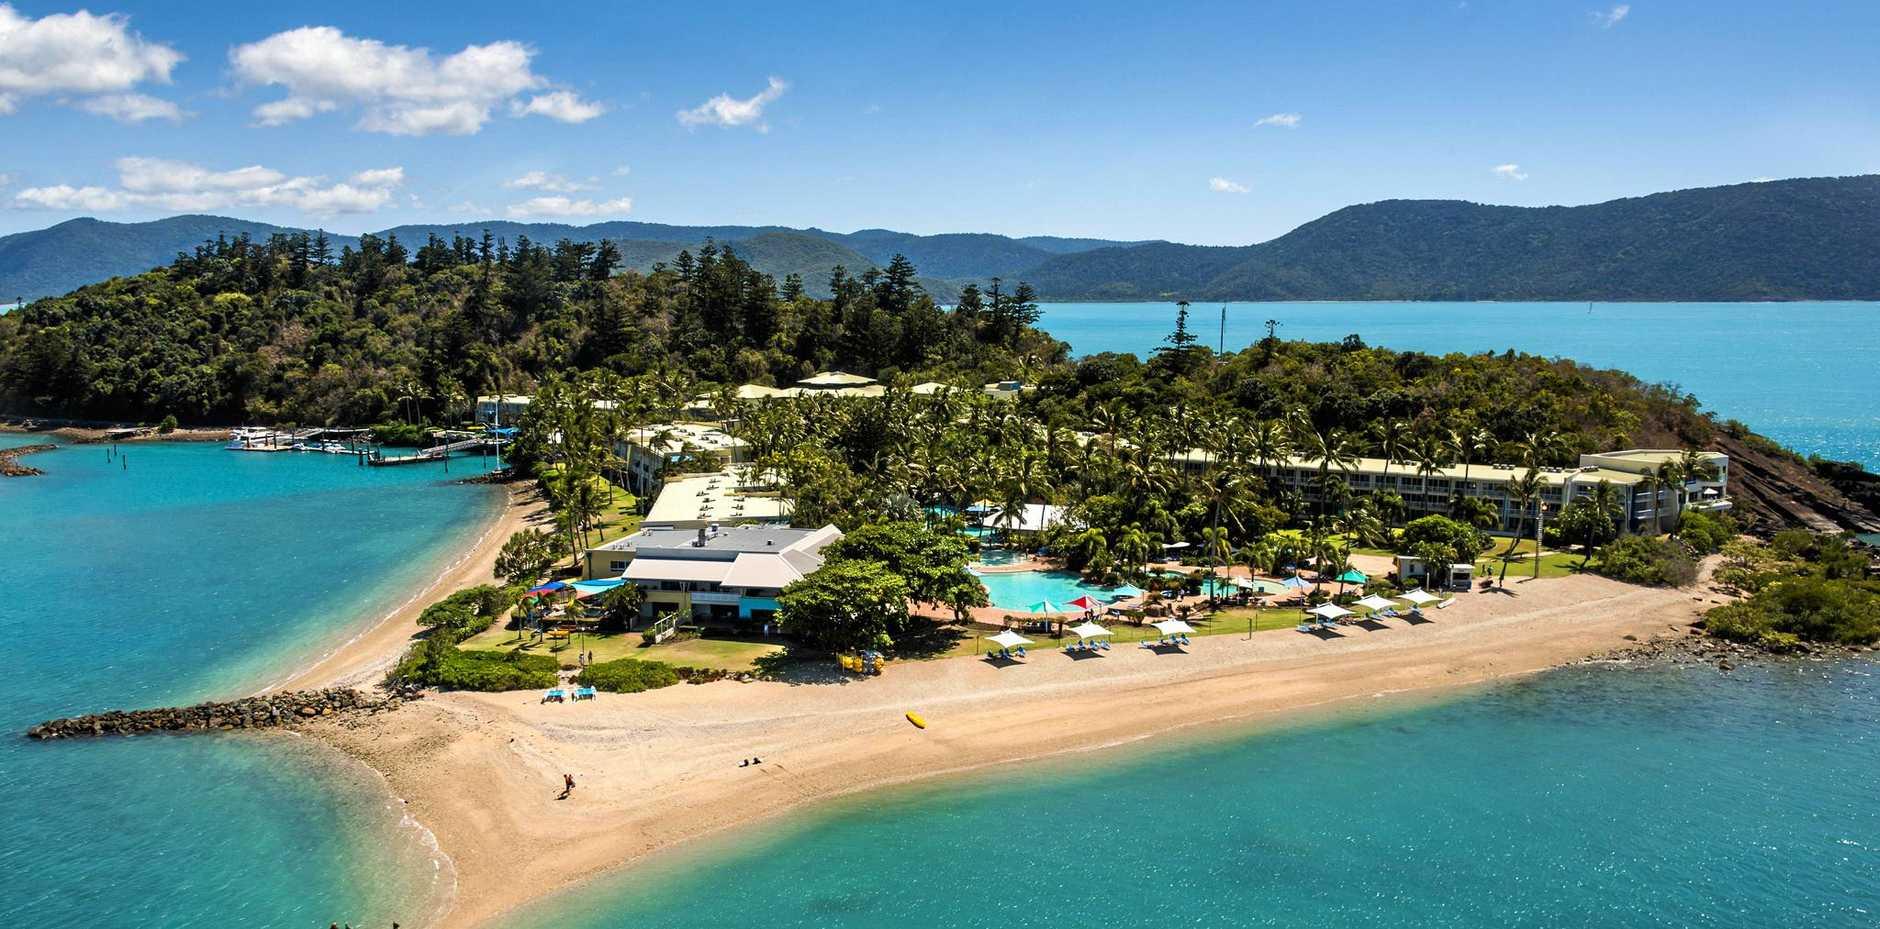 Daydream Island in the Whitsundays will undergo a $50million redevelopment this year.